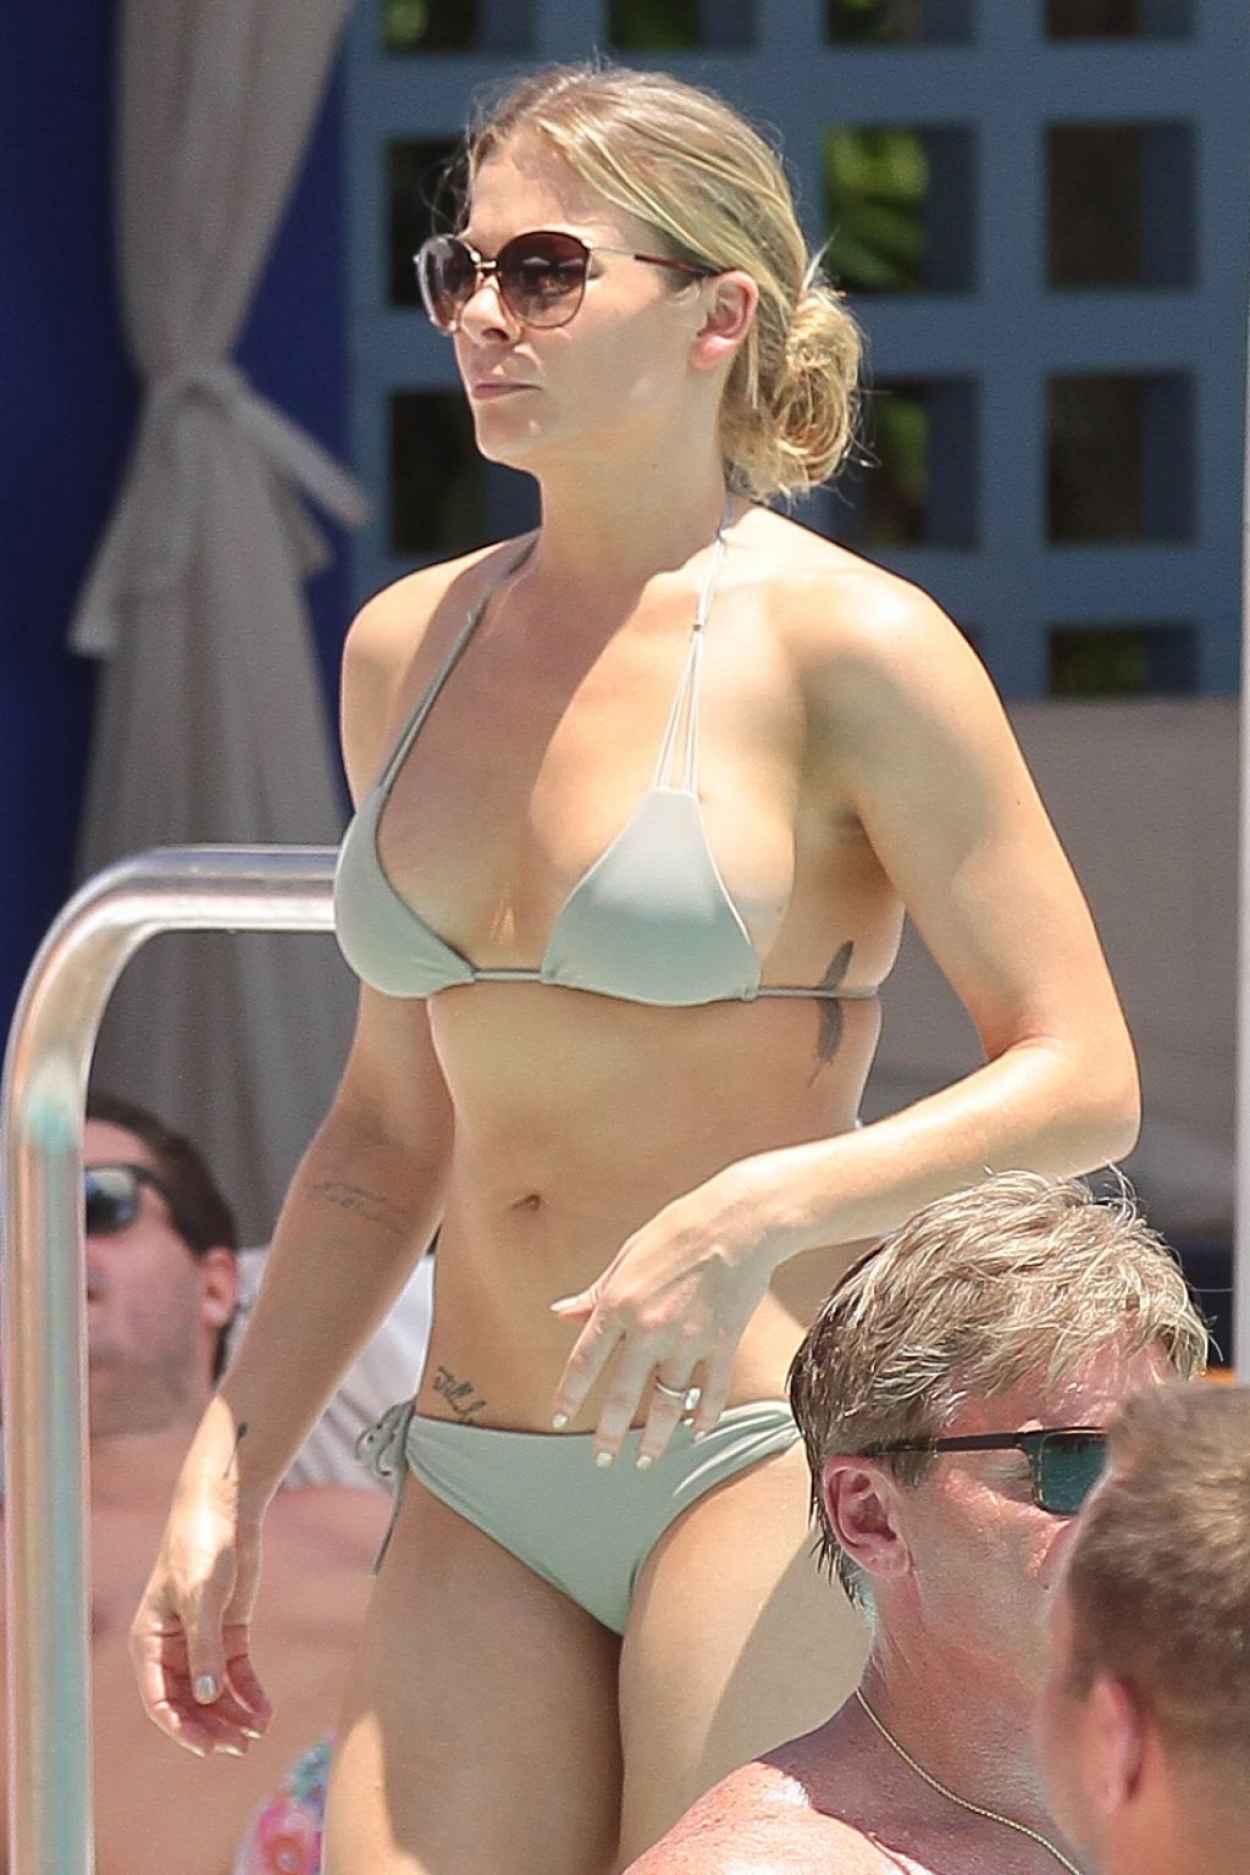 Bikini picture of leann rimes